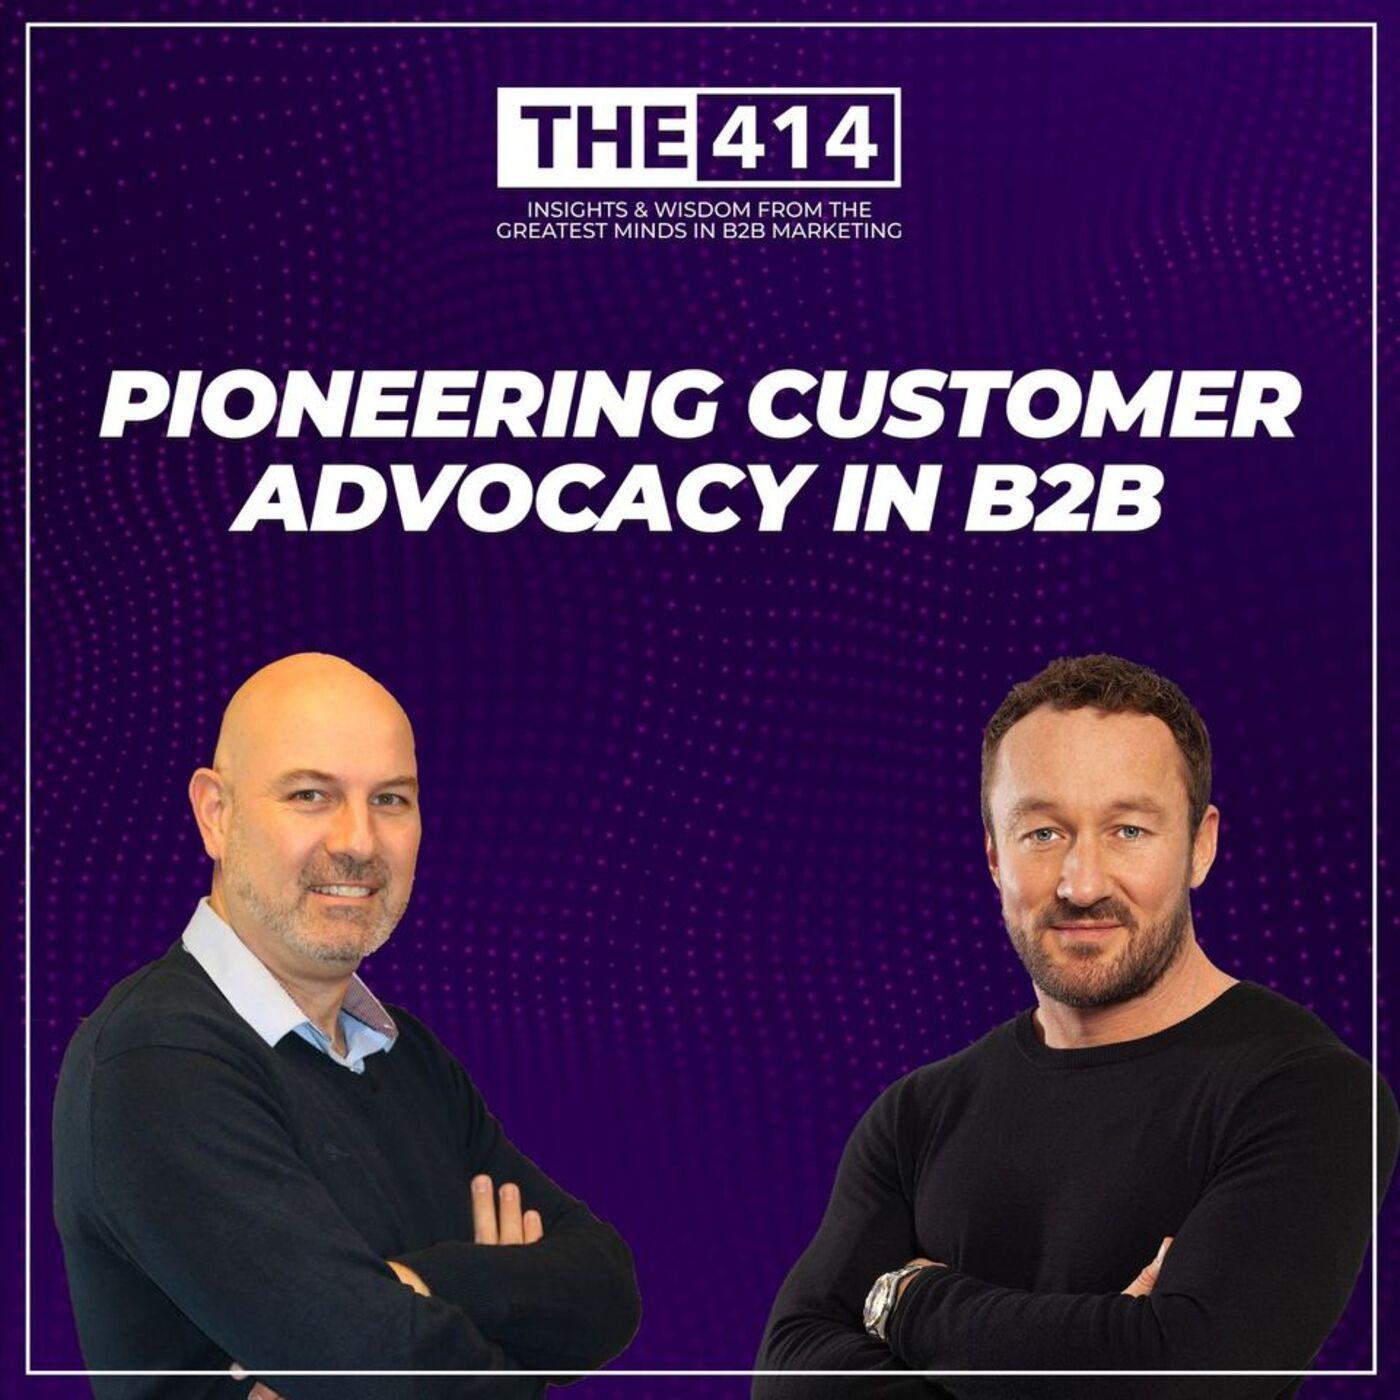 Pioneering Customer Advocacy in B2B